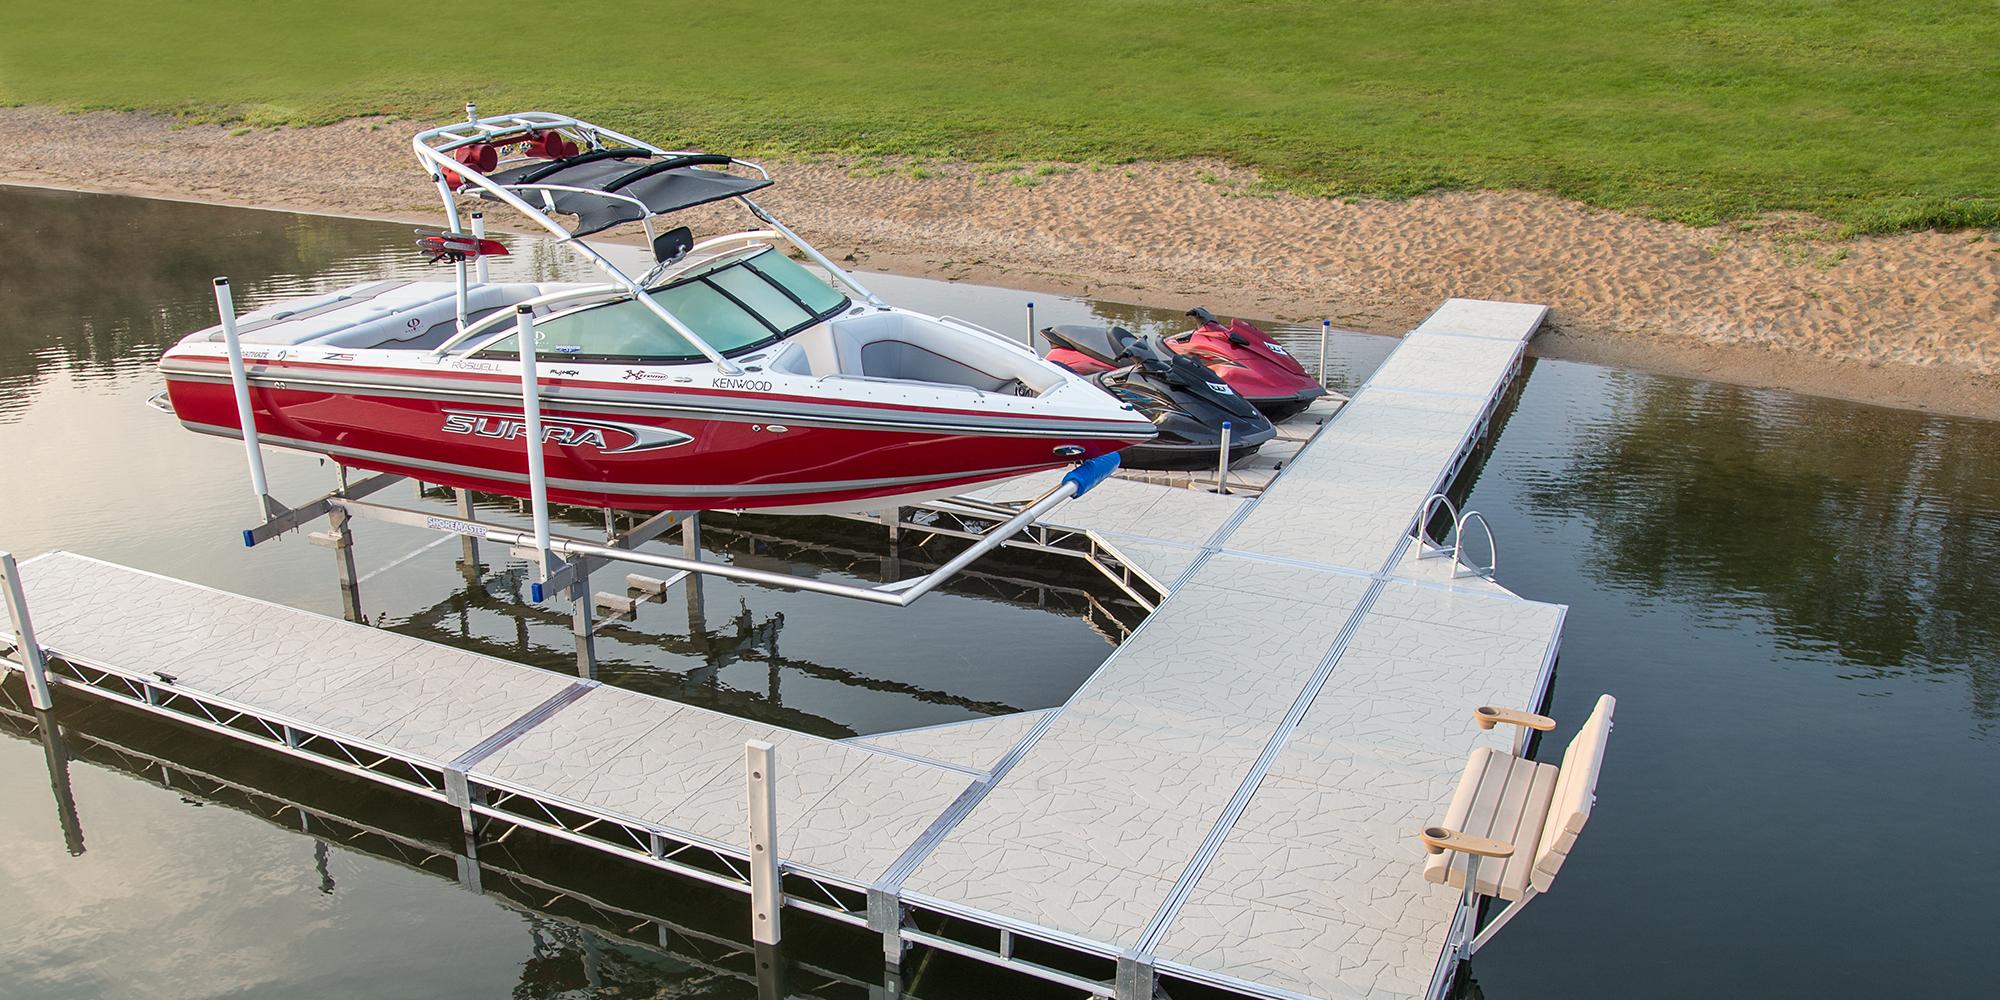 ShoreMaster Hydraulic Boat Lifts